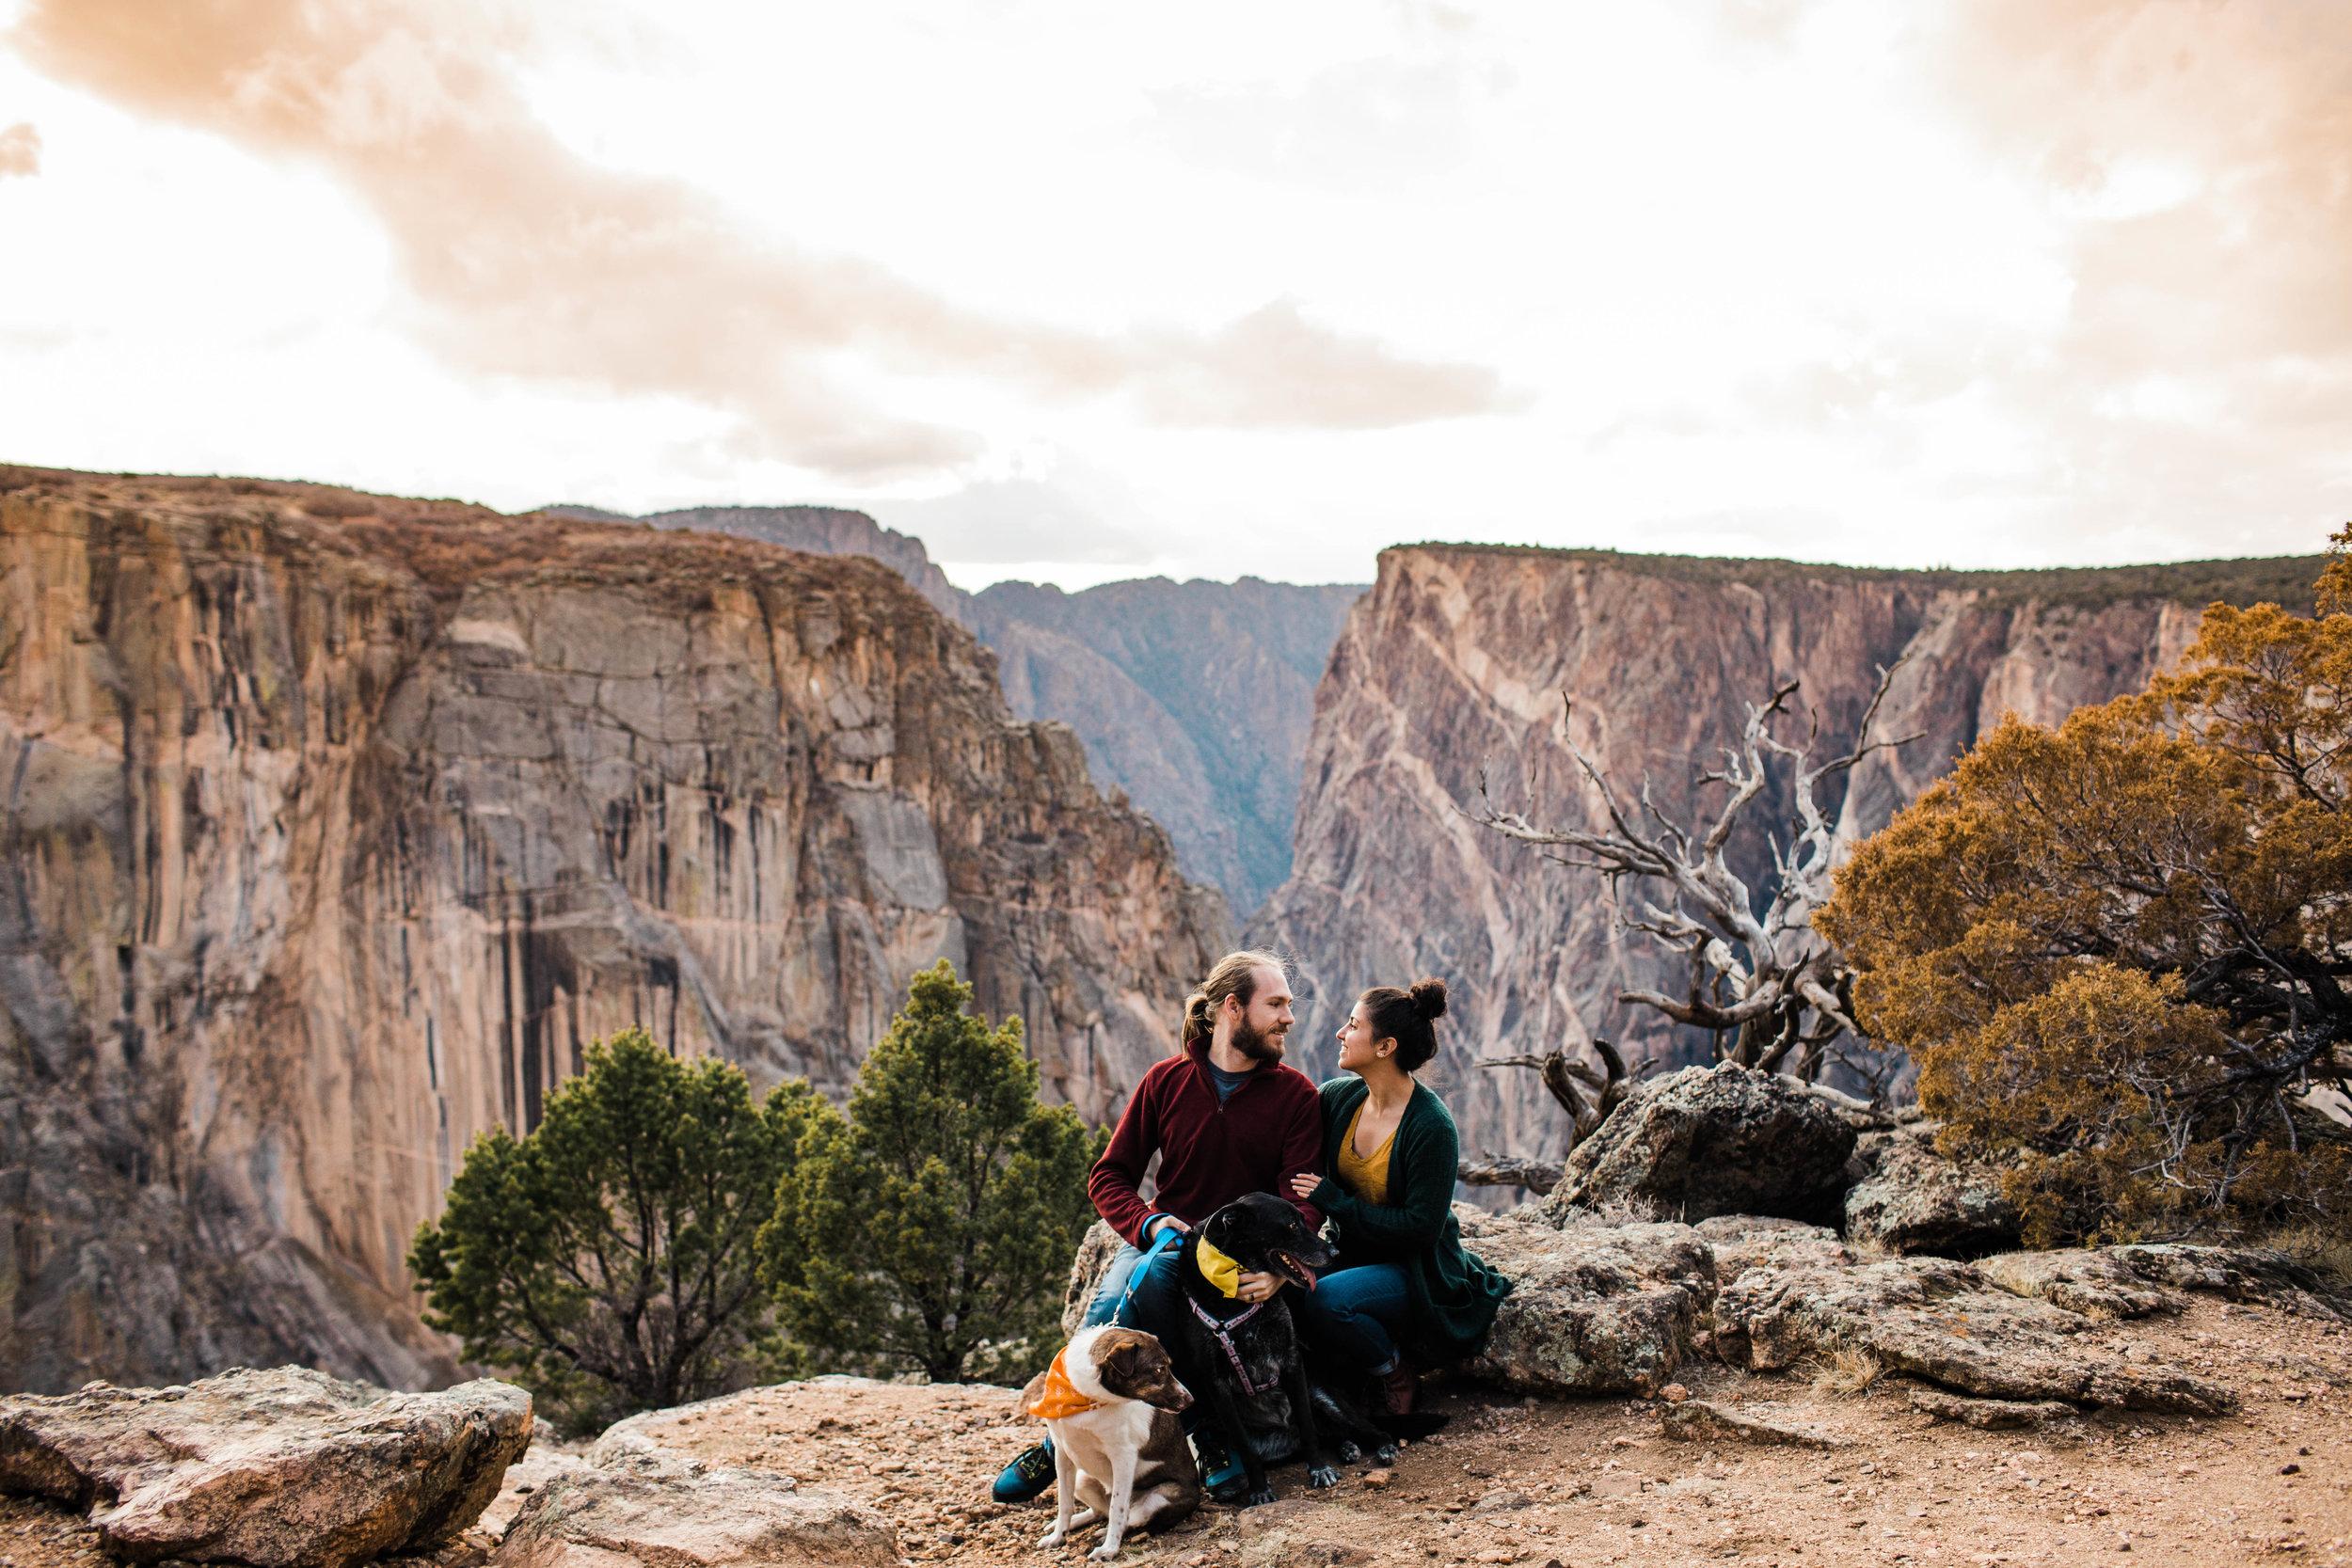 Sheena_Shahangian_Photography_Black_Canyon_Colorado_Moab_Utah_Adventure_Session_Road_Trip_Sheena_Ed-1.jpg